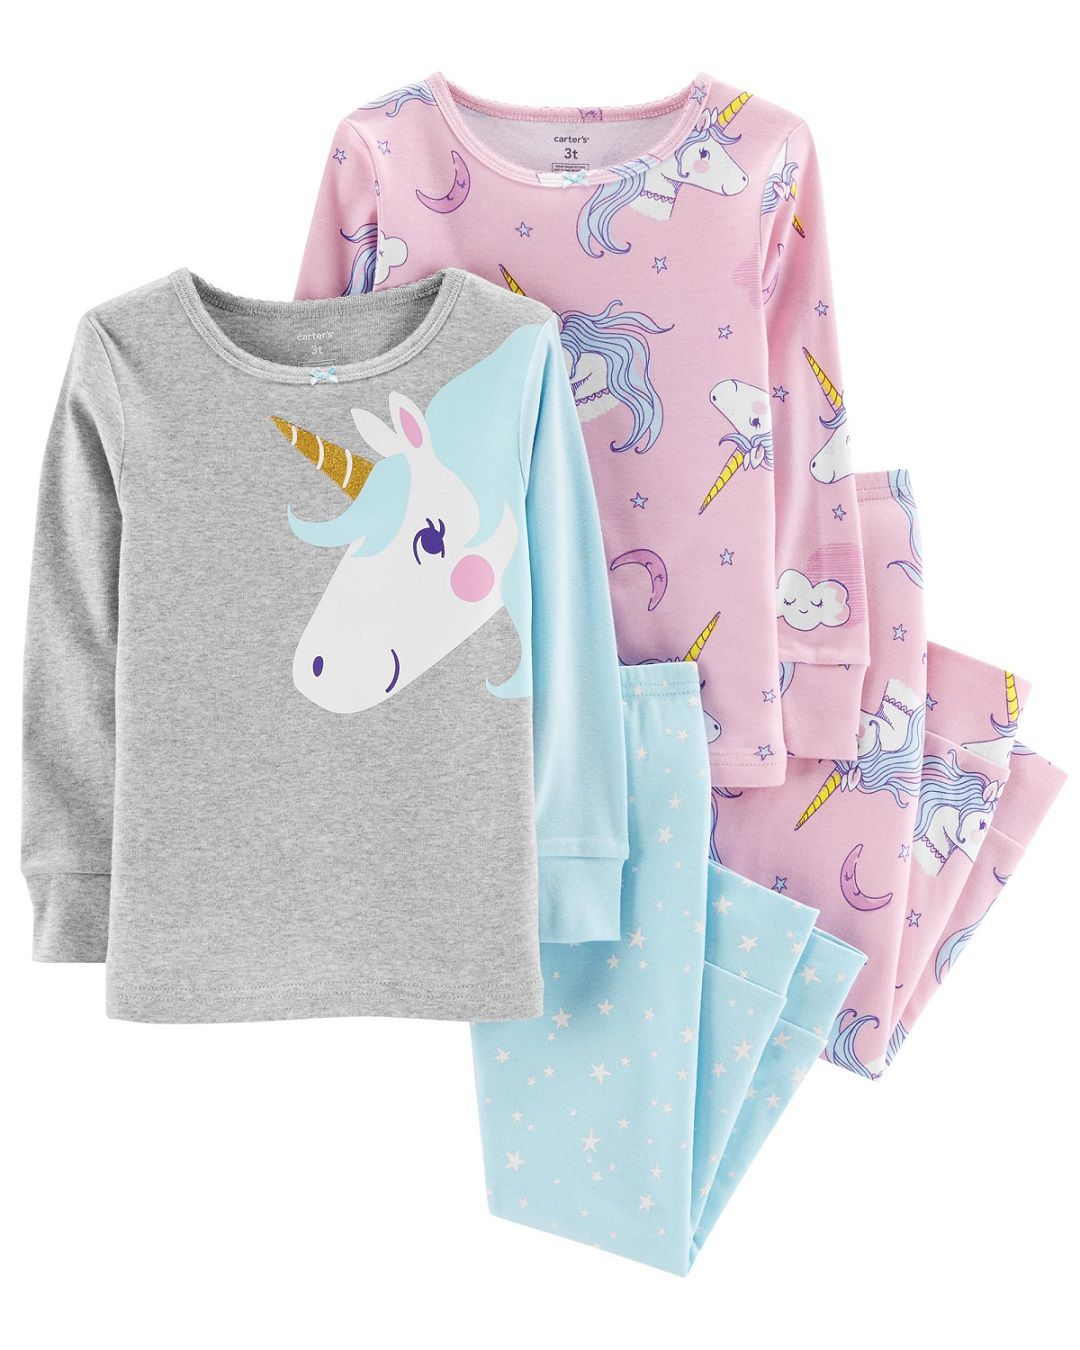 030e44fb5 Pijama Carters 4 Peças - 2T - 24062010 UNICORNIO - Le Petite Baby Store ...